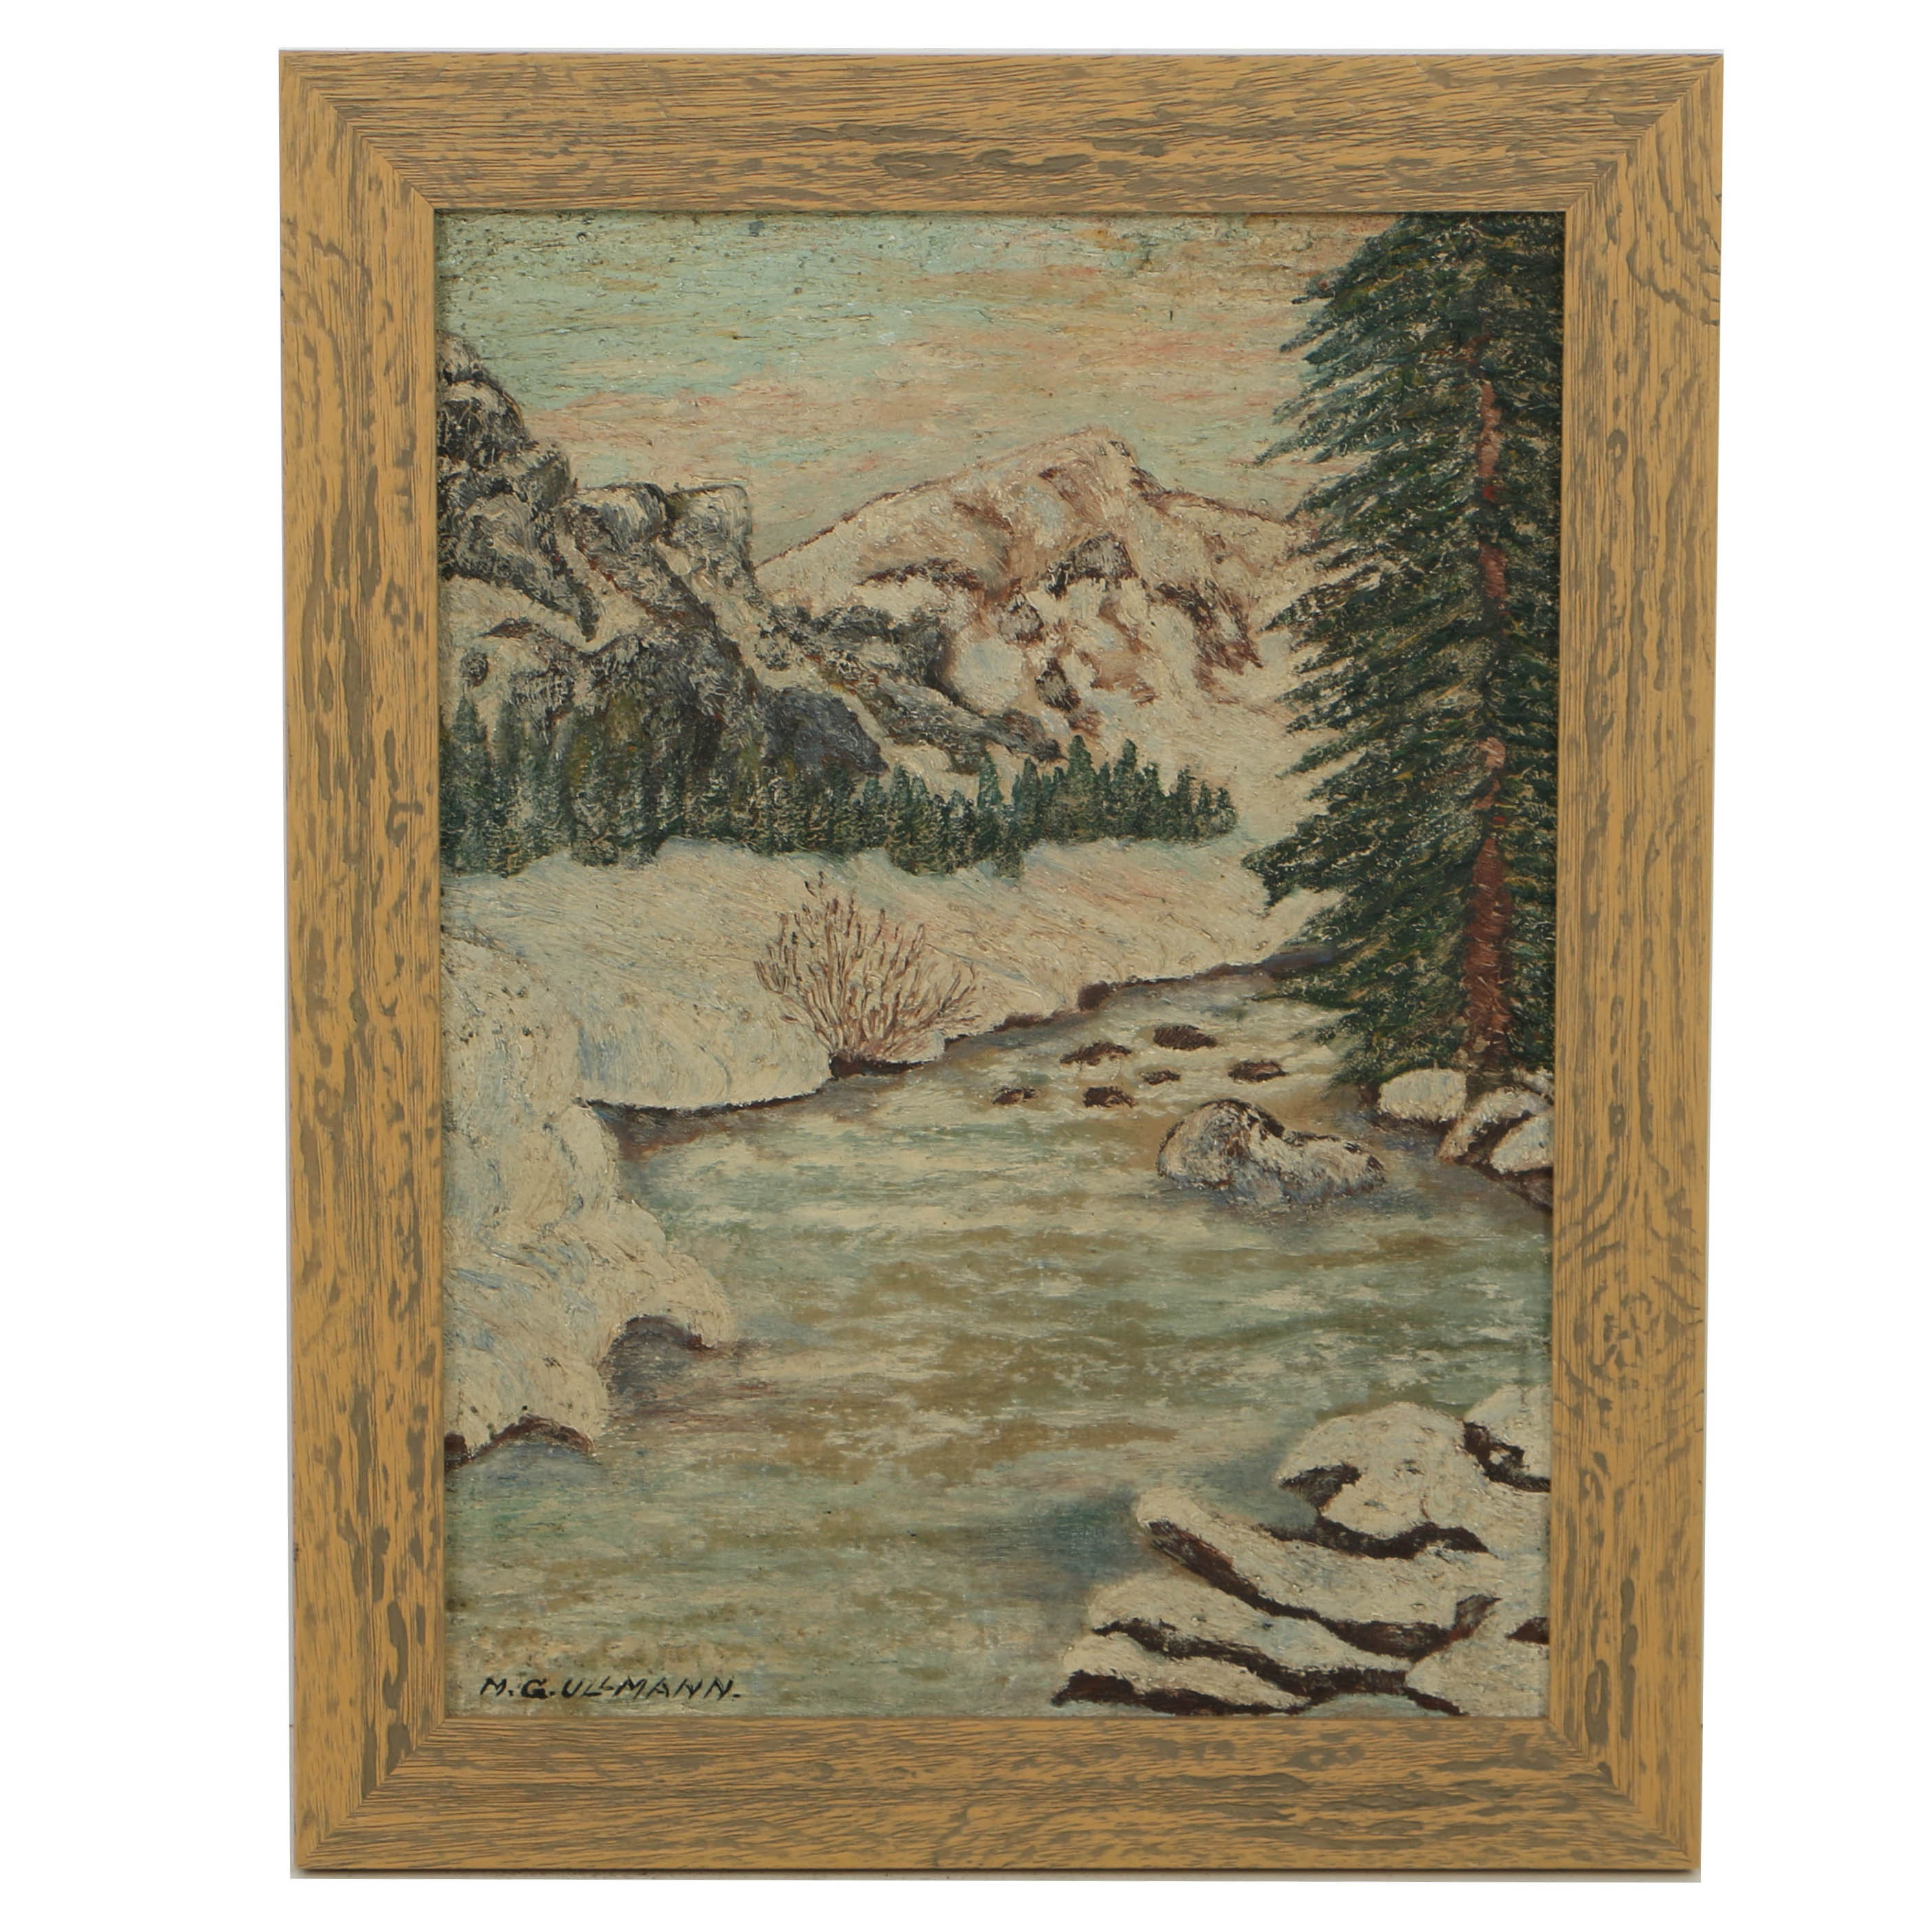 M.G. Ullmann Oil Painting on Wood of Mountainous Landscape